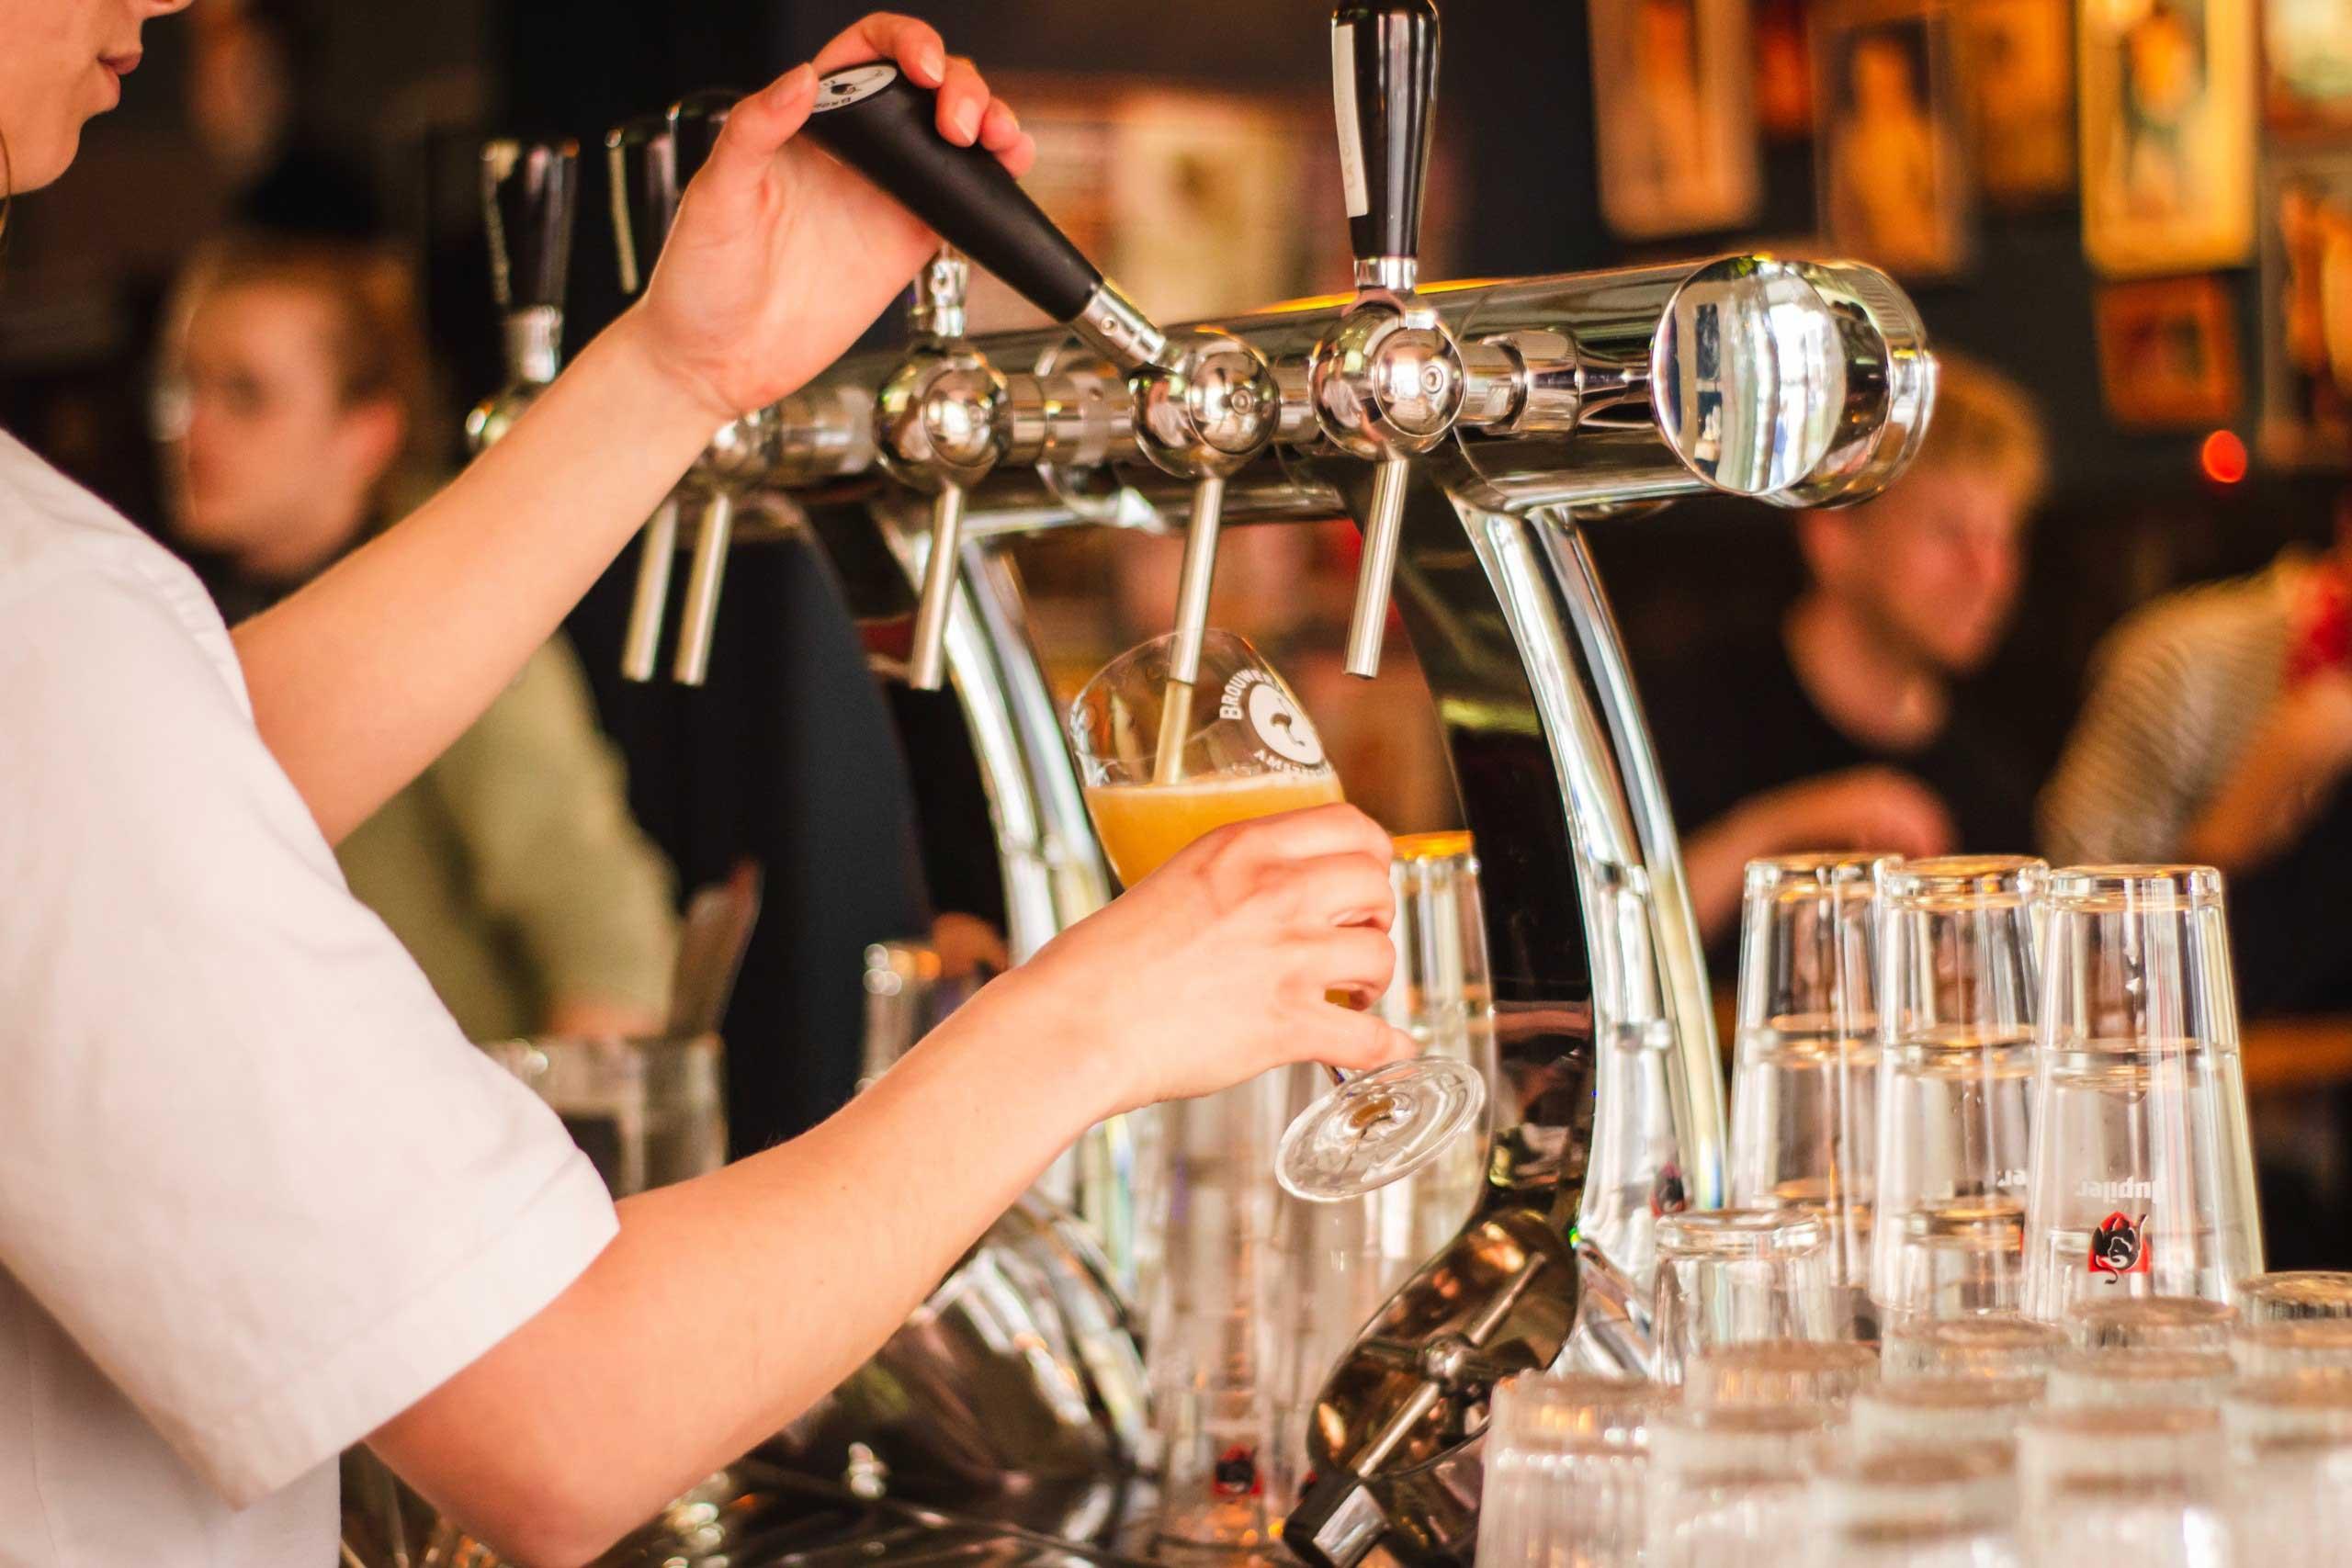 Man serving drinks